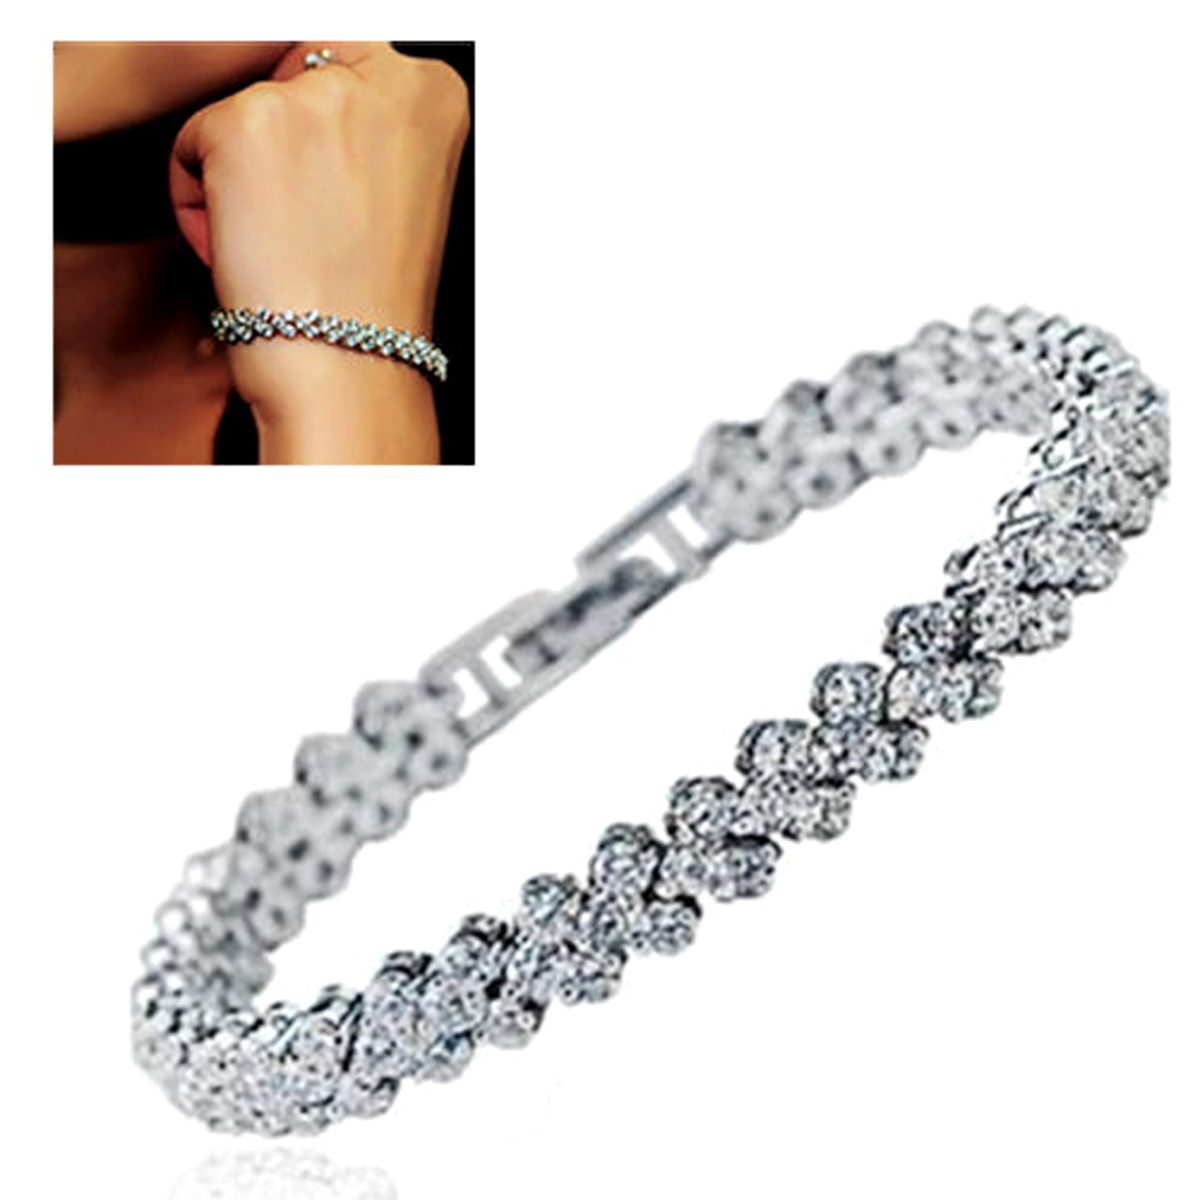 Luxury Vintage Bracelet Crystal Bracelets For Women Charm Silver Bracelets & Bangles Femme Bridal Wedding Fine Jewelry Gift